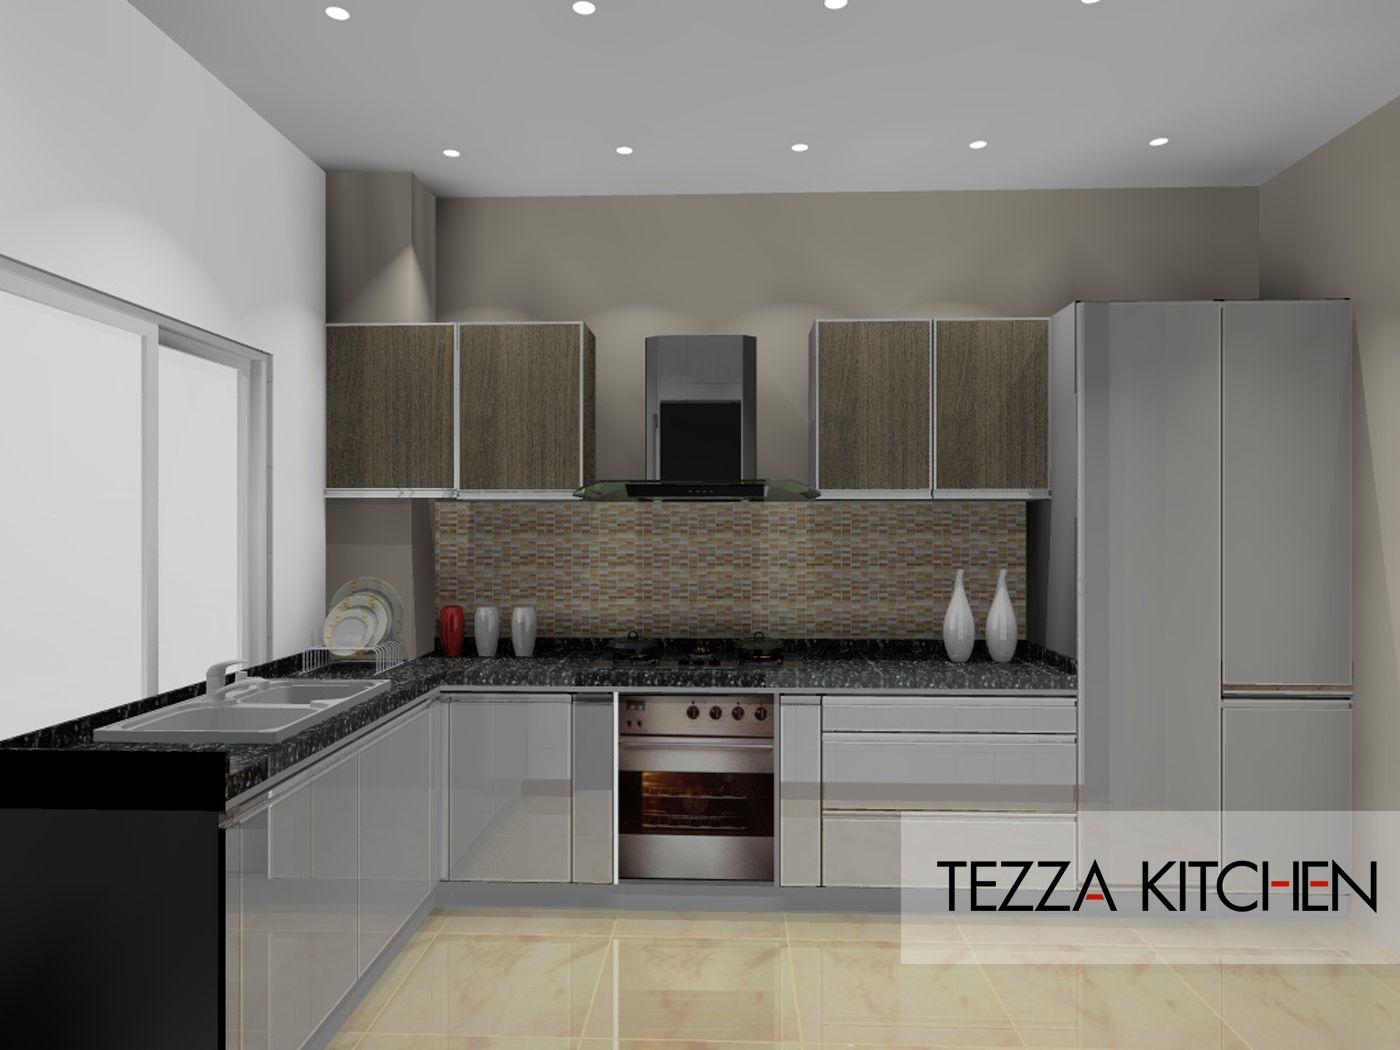 Wet Kitchen Kitchen design, Kitchen, Kitchen